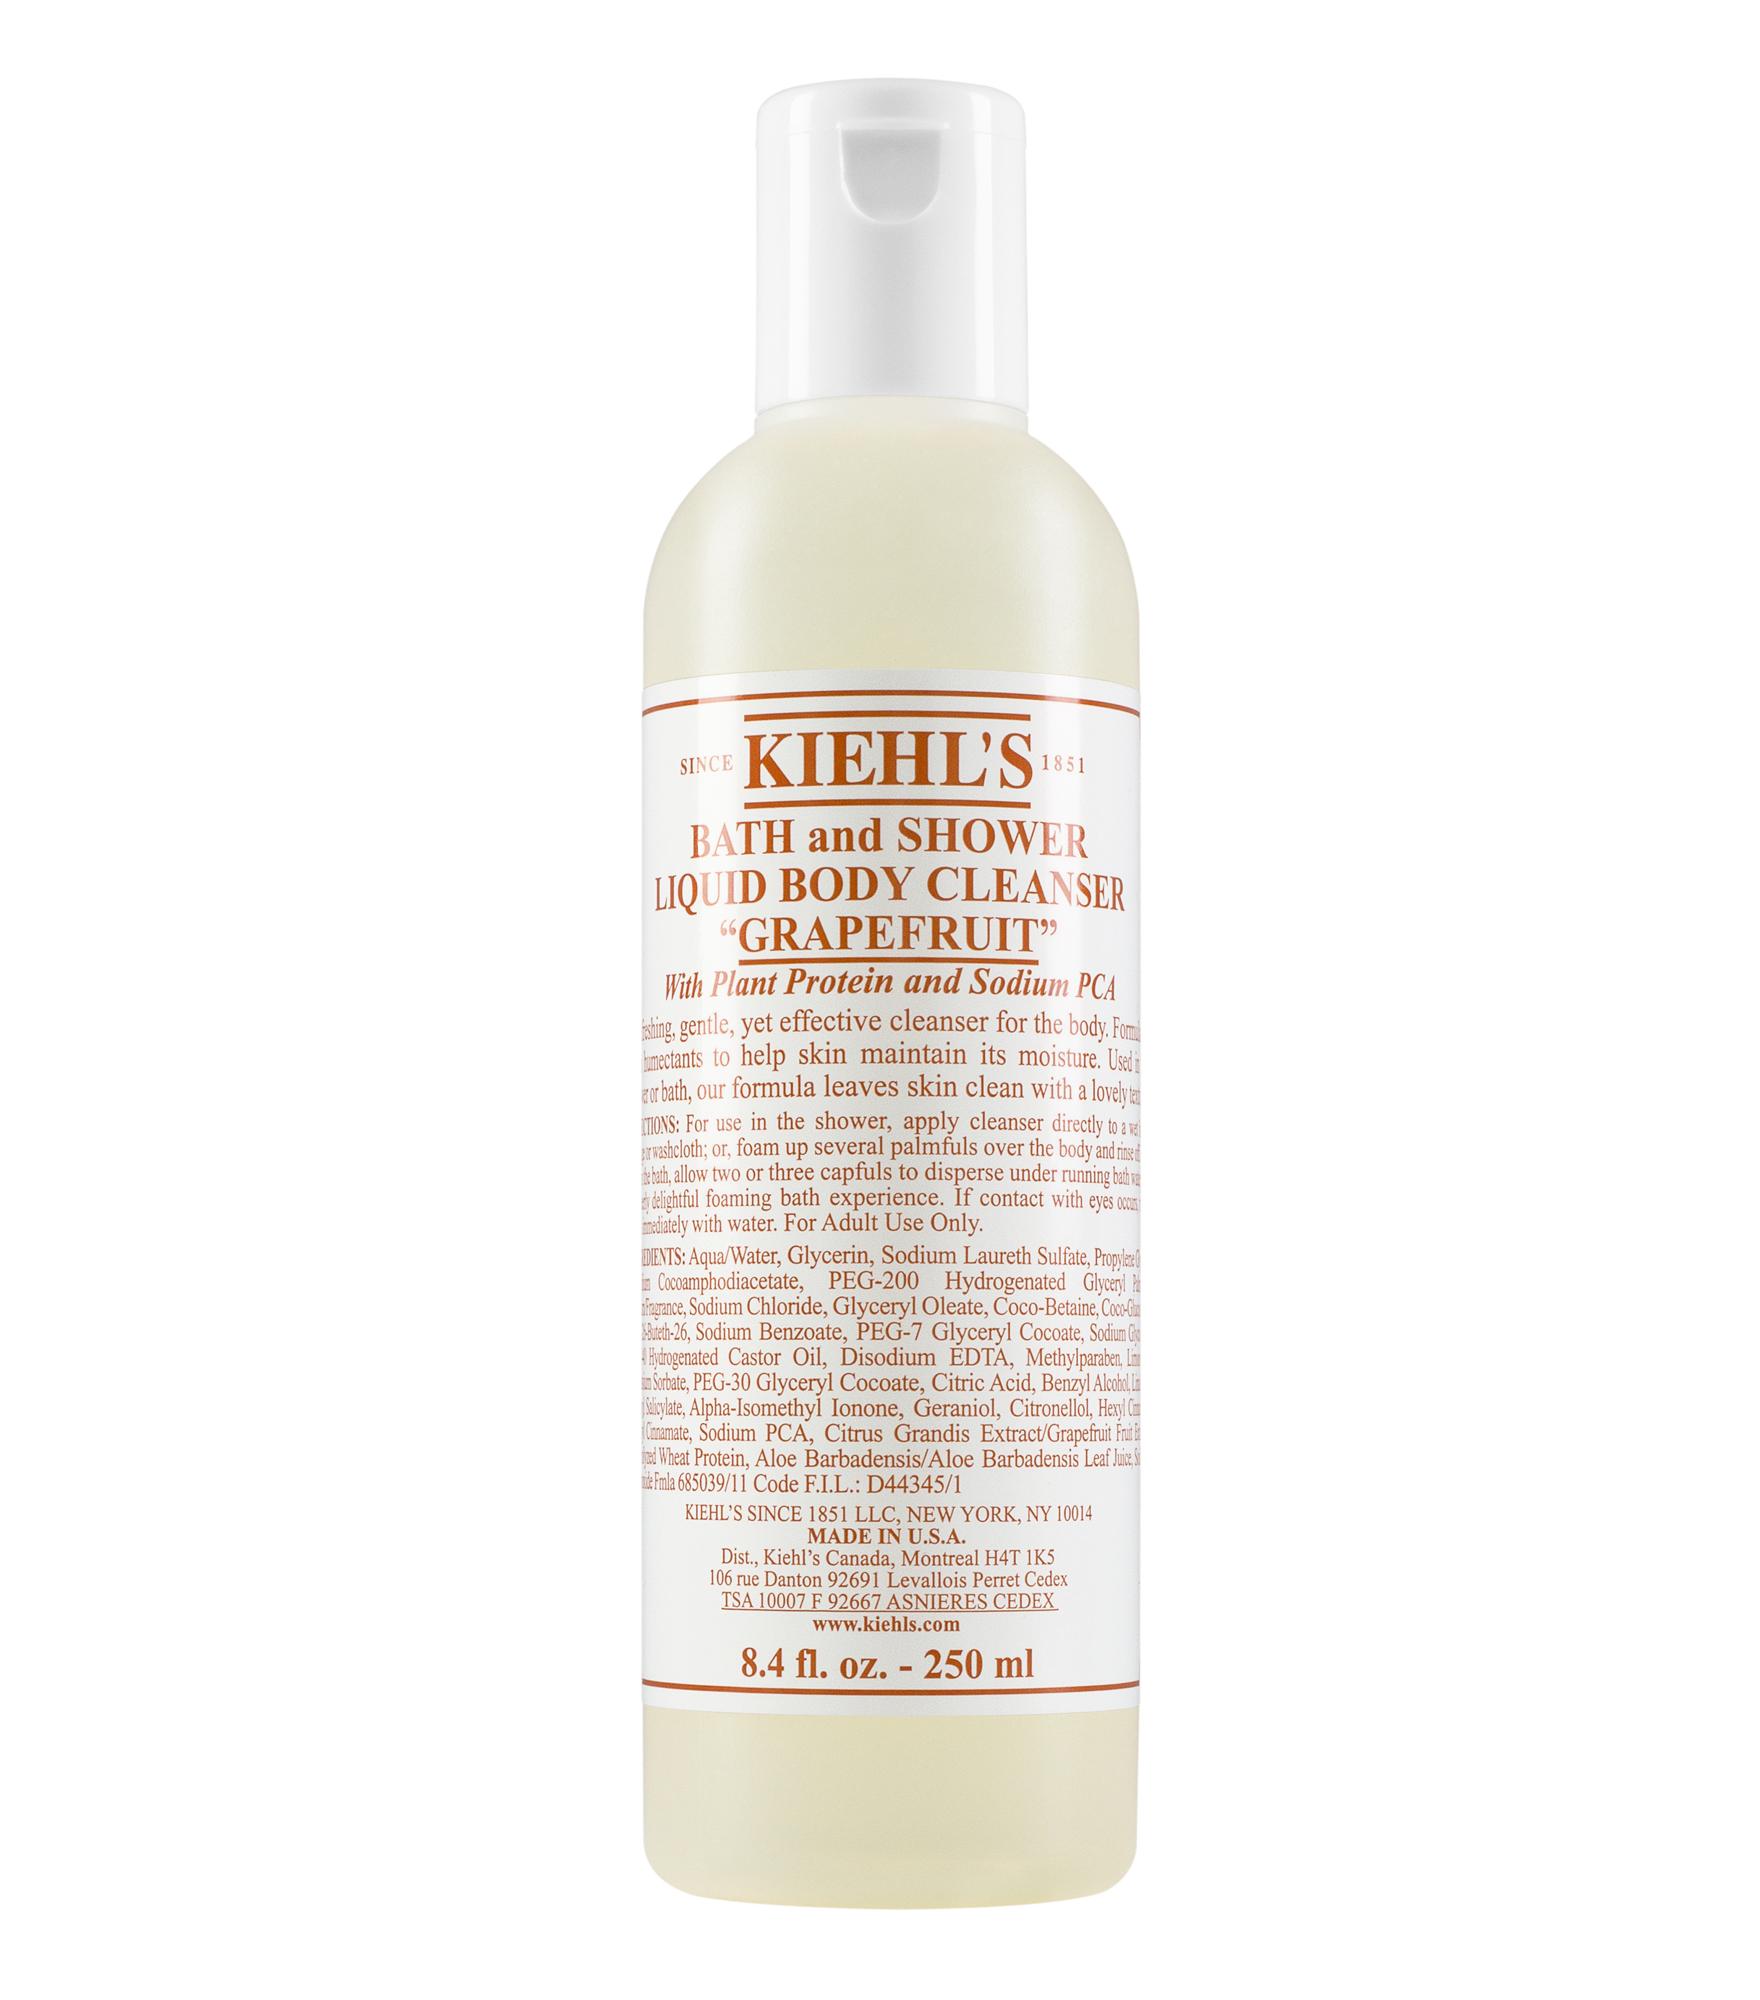 Bath And Shower Liquid Body Cleanser Foaming Wash Kiehls Ovale Cleansing Gel Aloe Vera